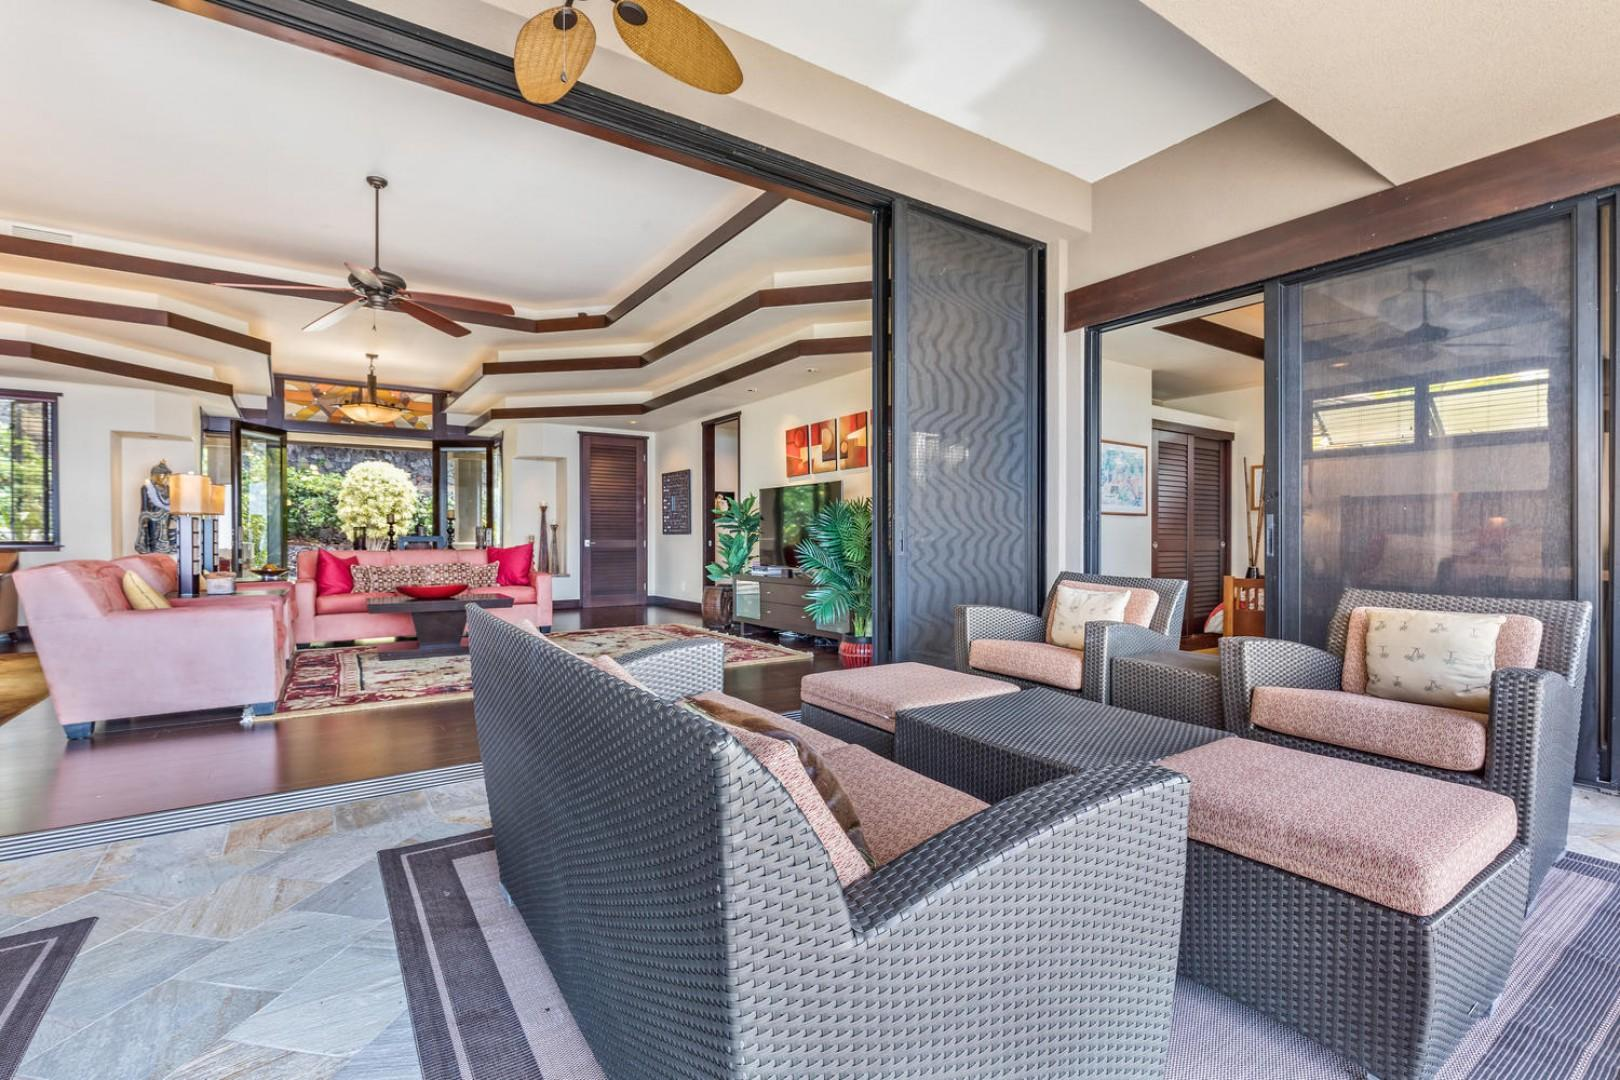 Enjoy the spacious outdoor Lanai seating and dining!